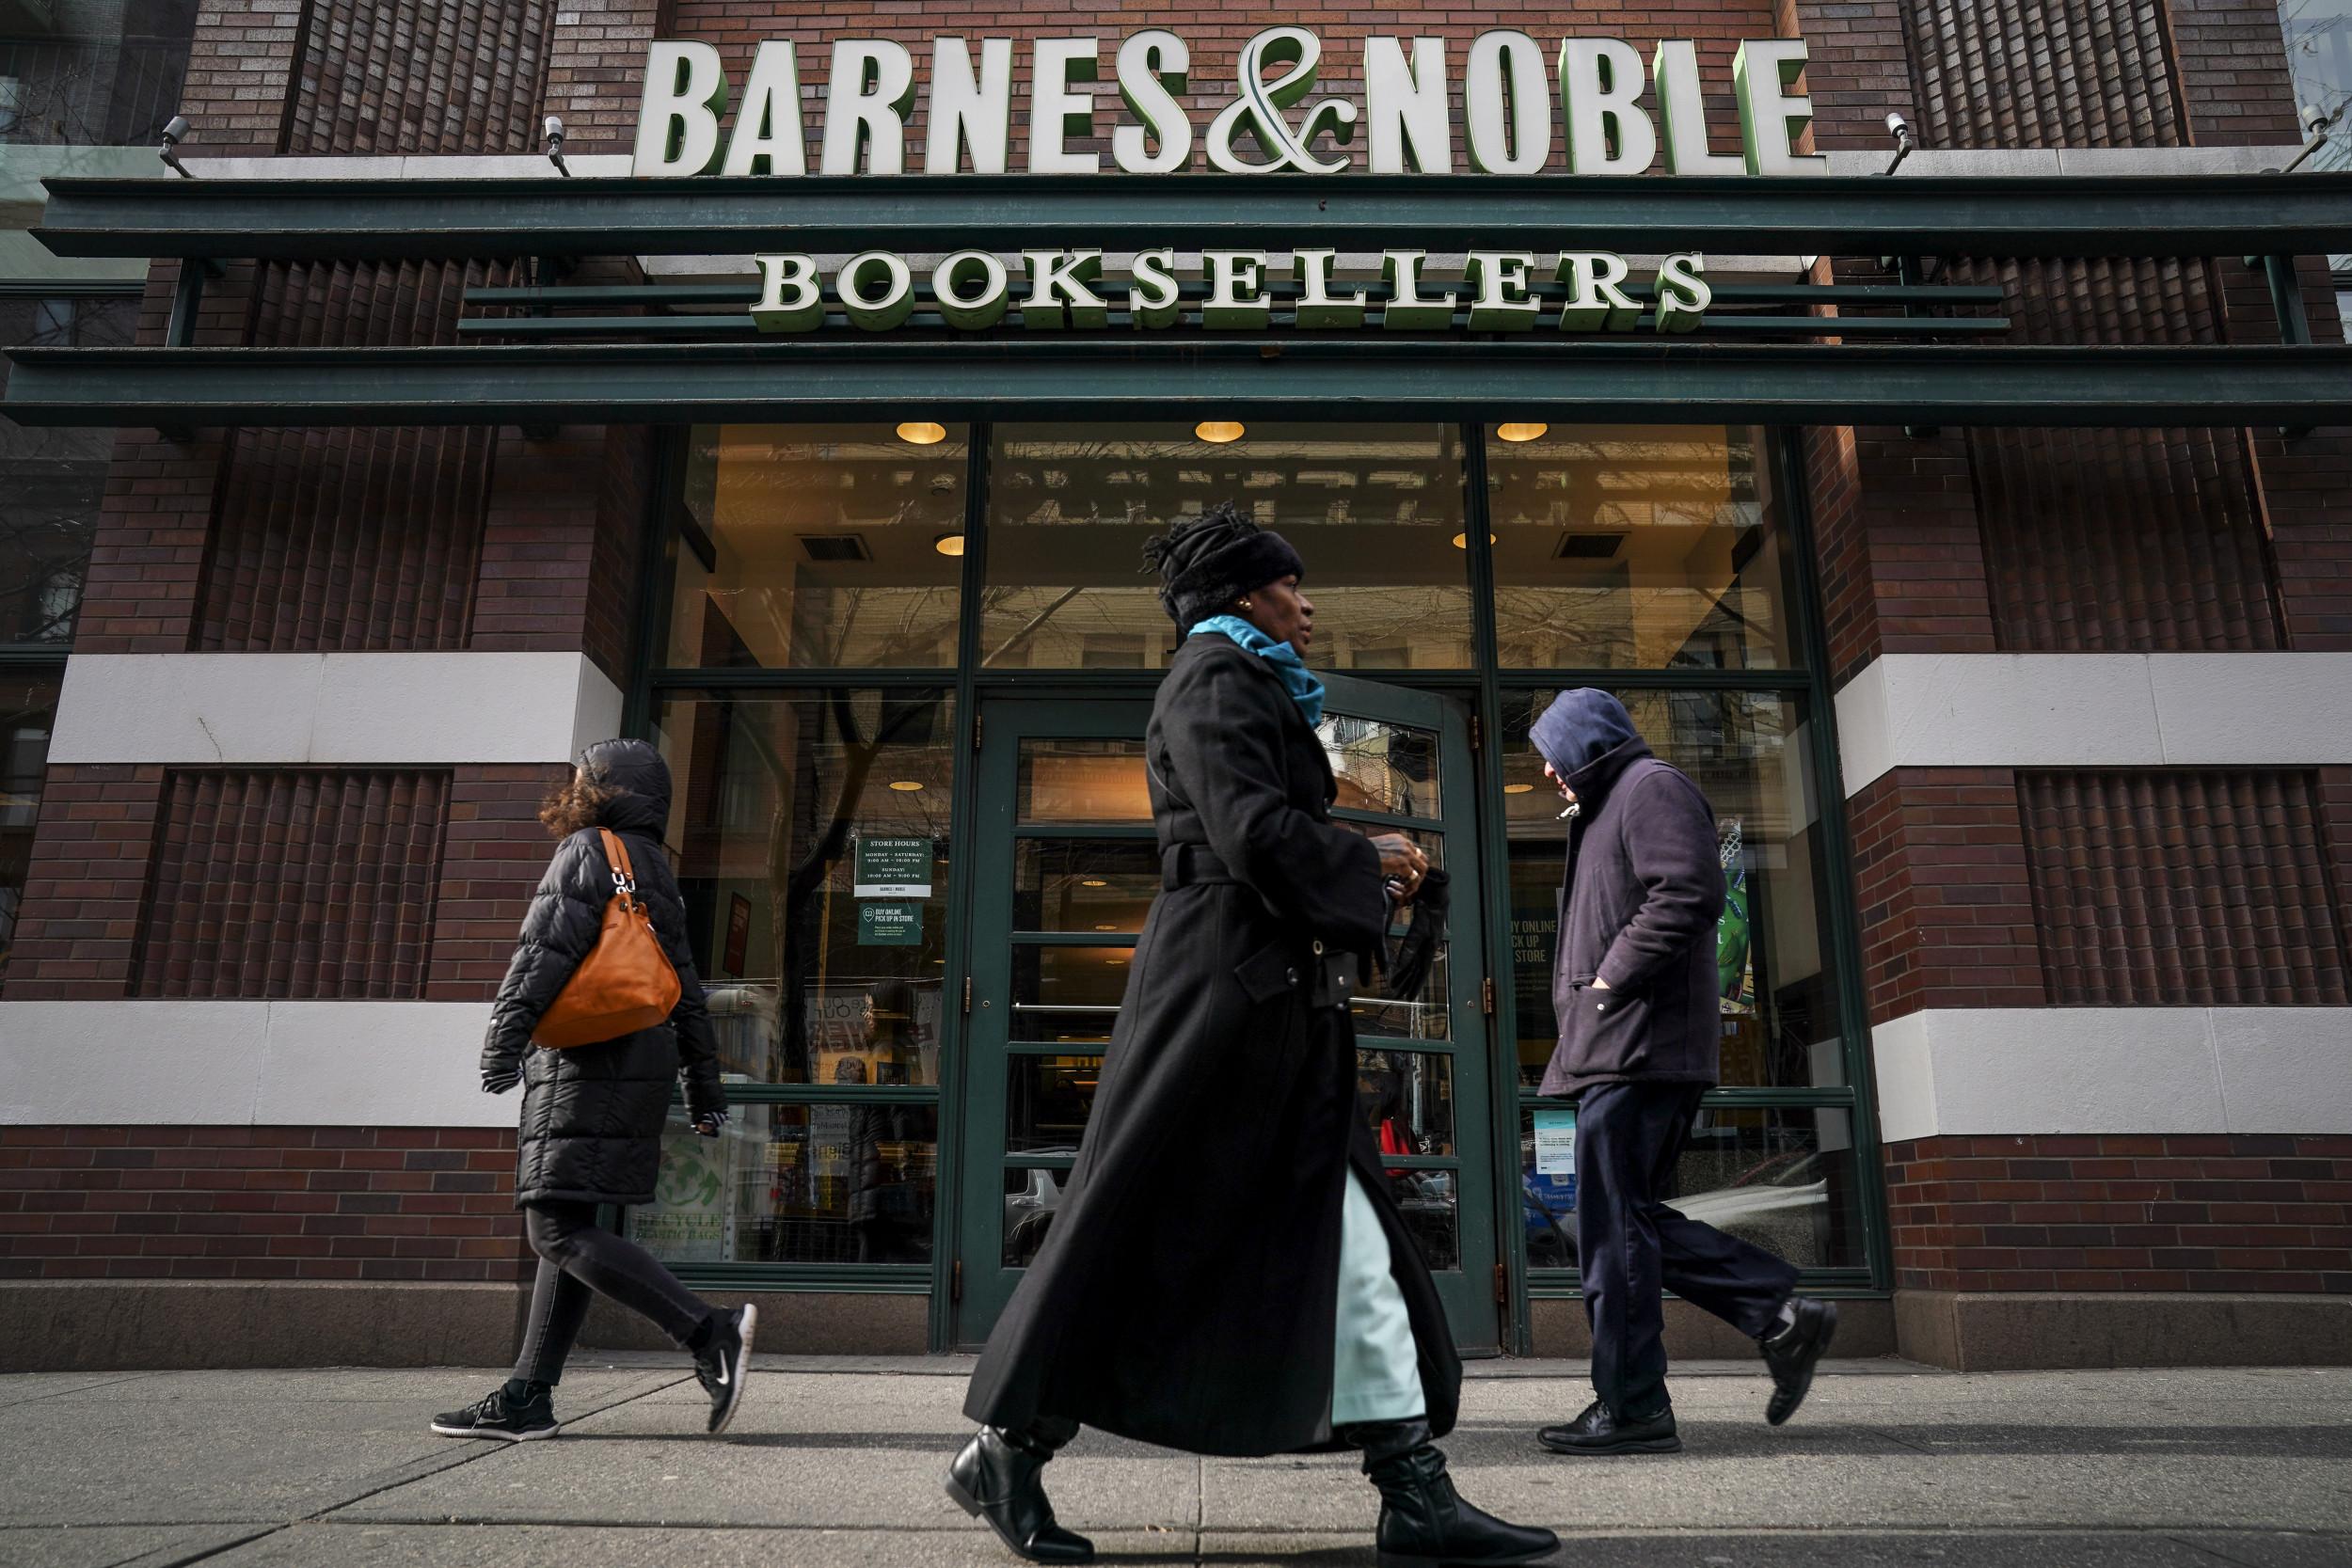 Ex-University Employee Sues Barnes & Noble Over Alleged Racism